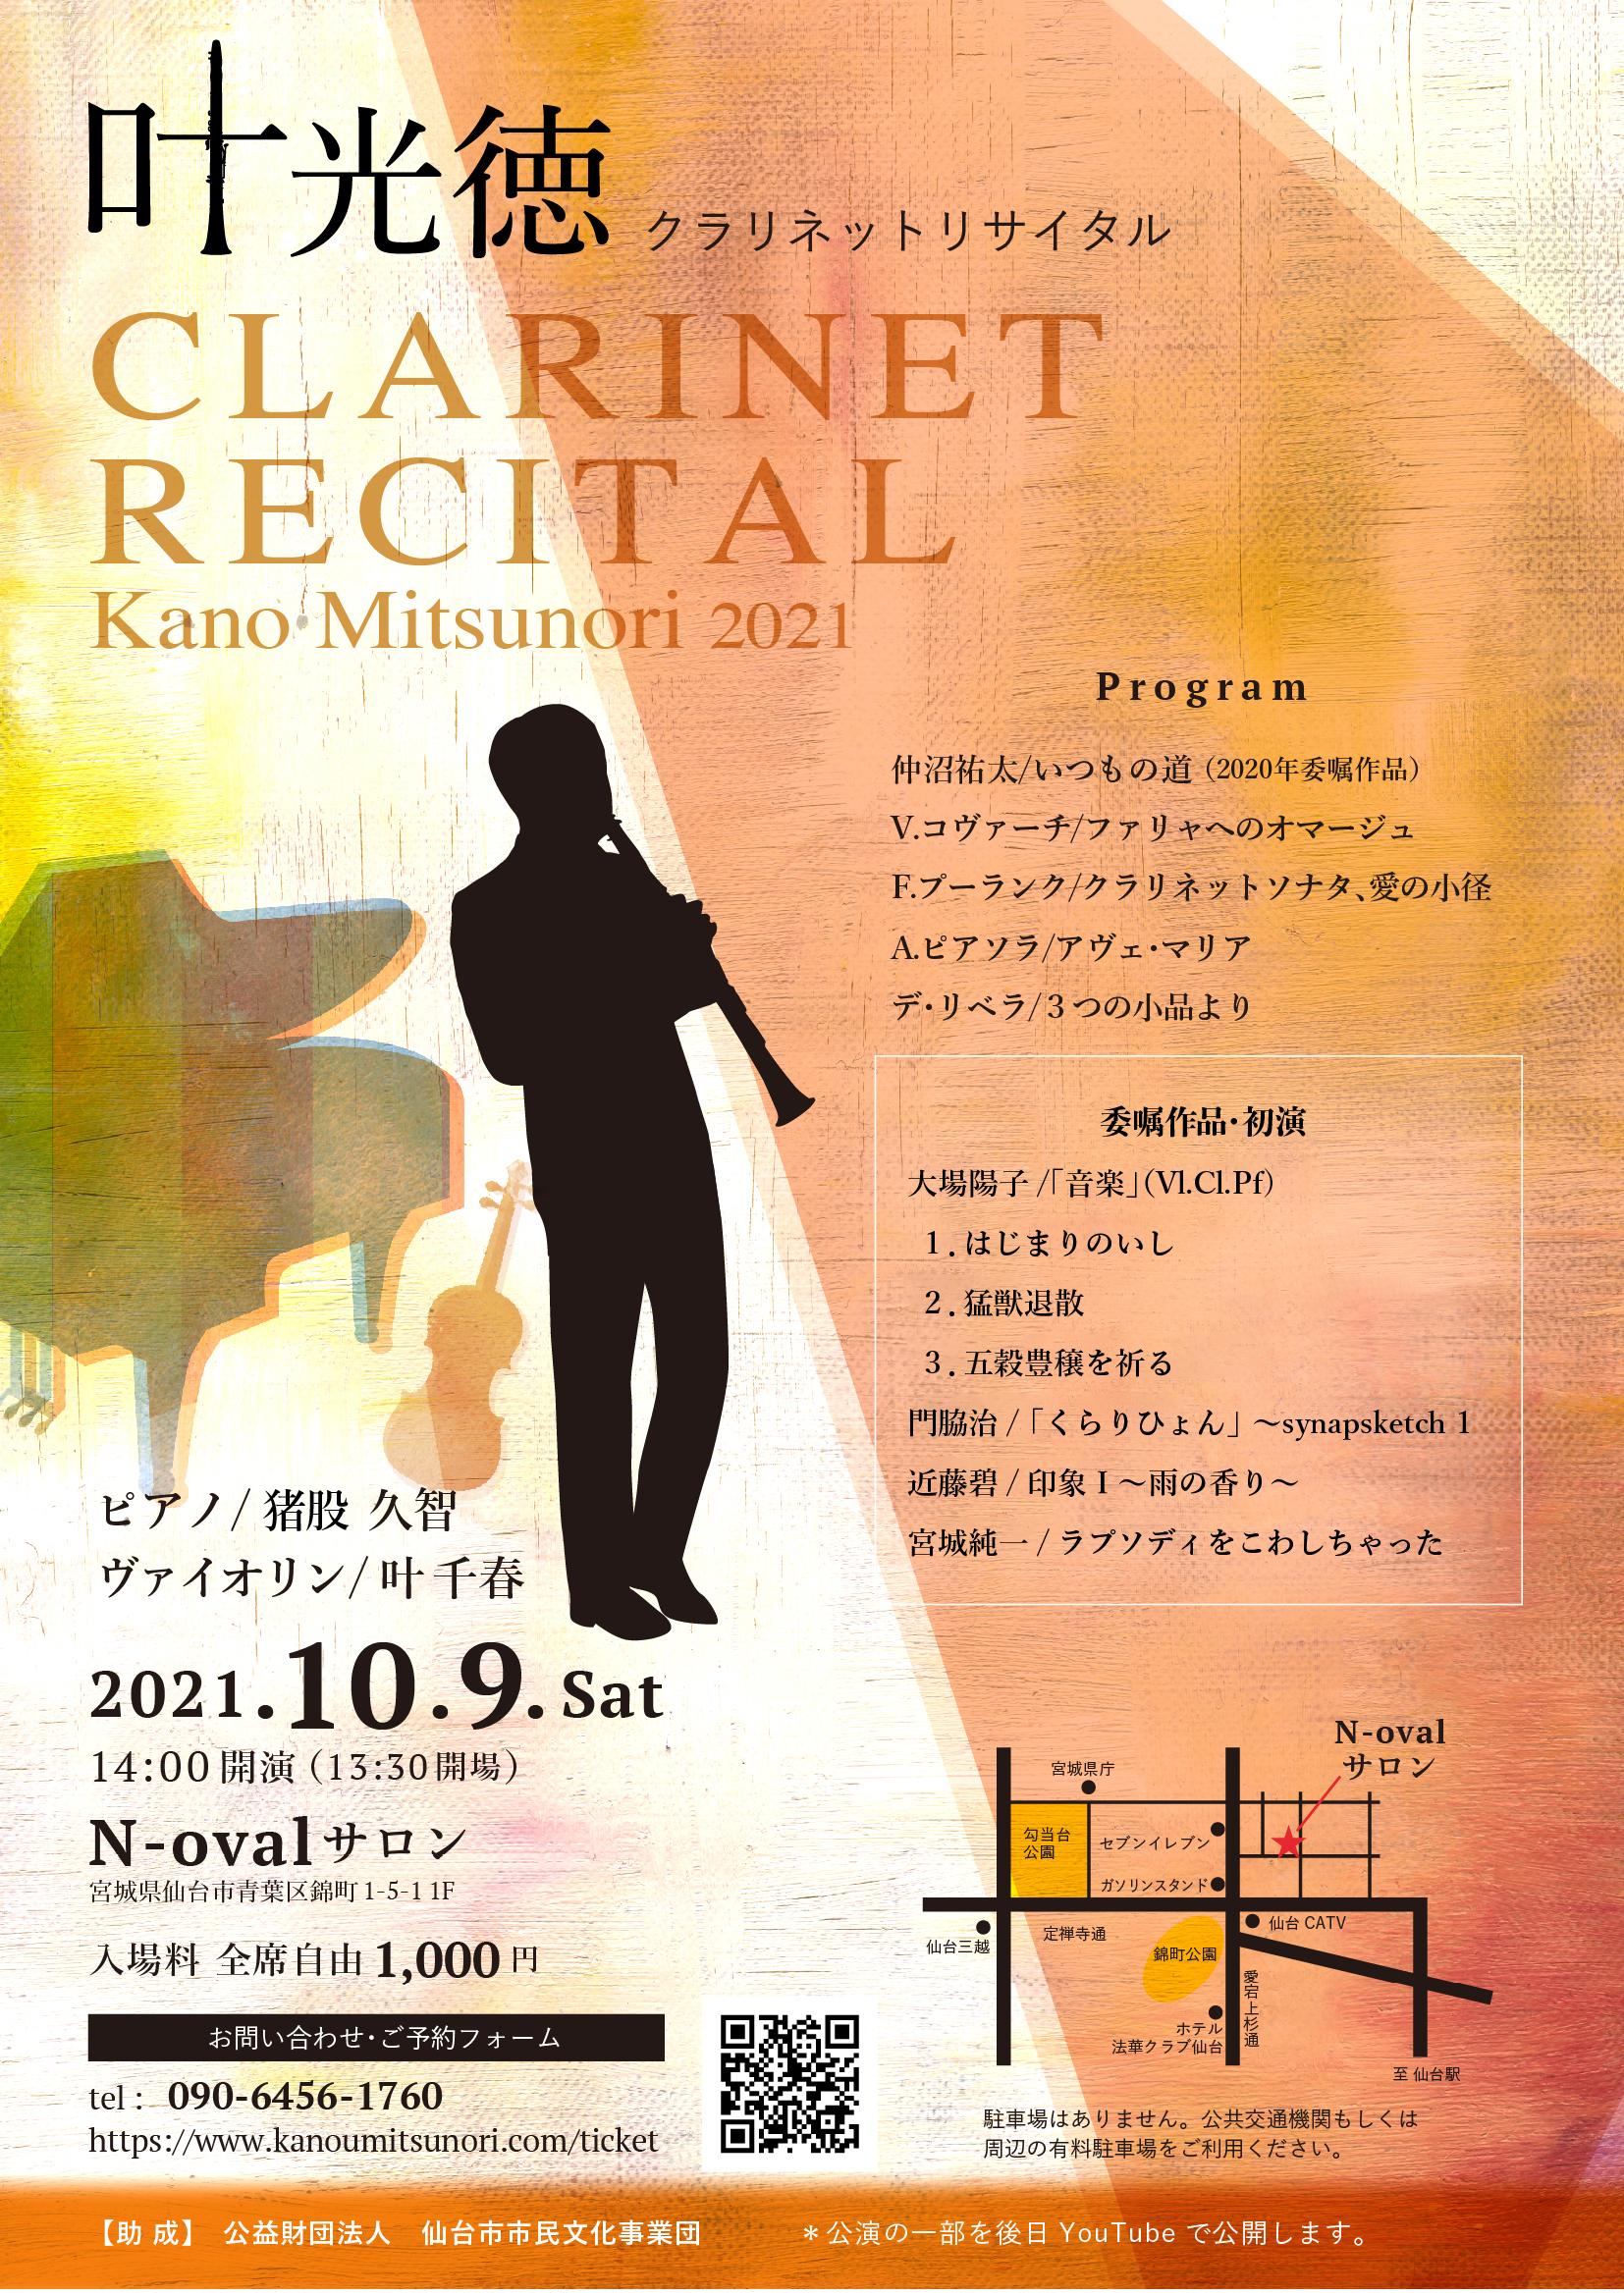 Kano_mitsunori_clarinet_flyer2021